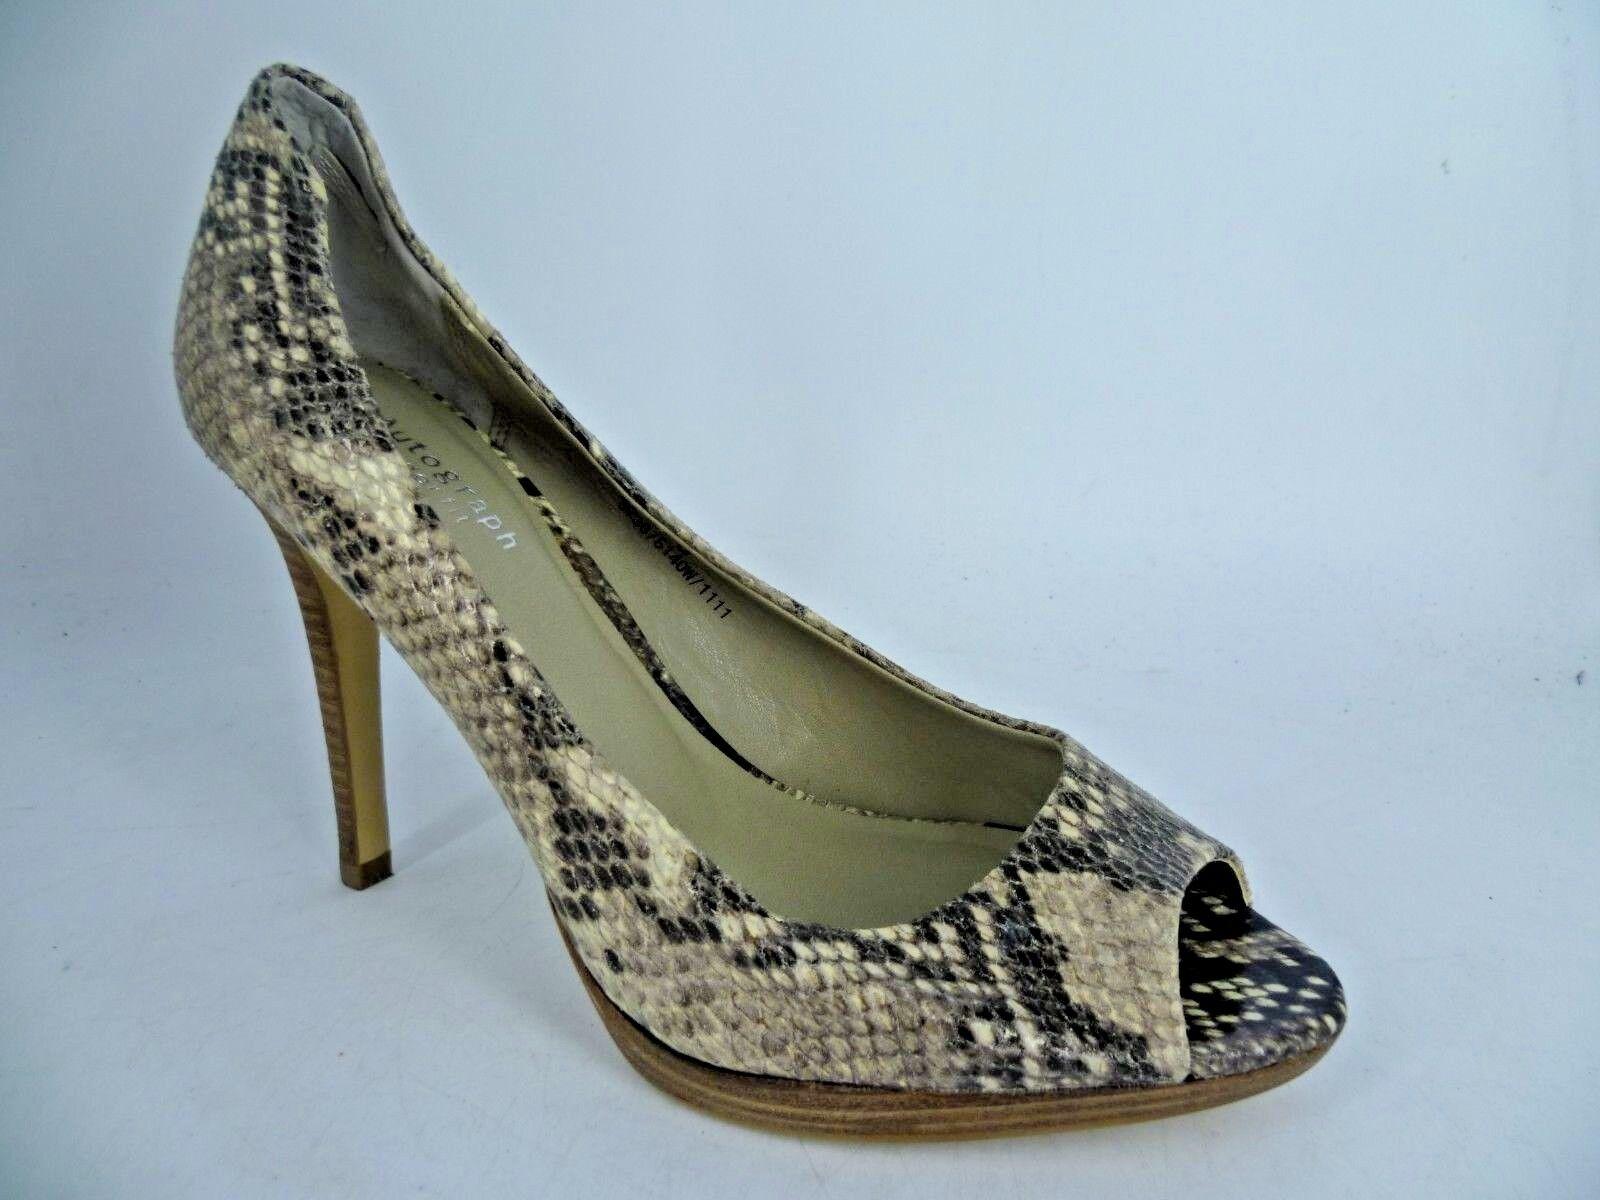 Marks & Spencers Wide Fit Fit Fit Peep Toe Snake Print schuhe UK 6 EU 39.5 LN091 GG 09 734b4e